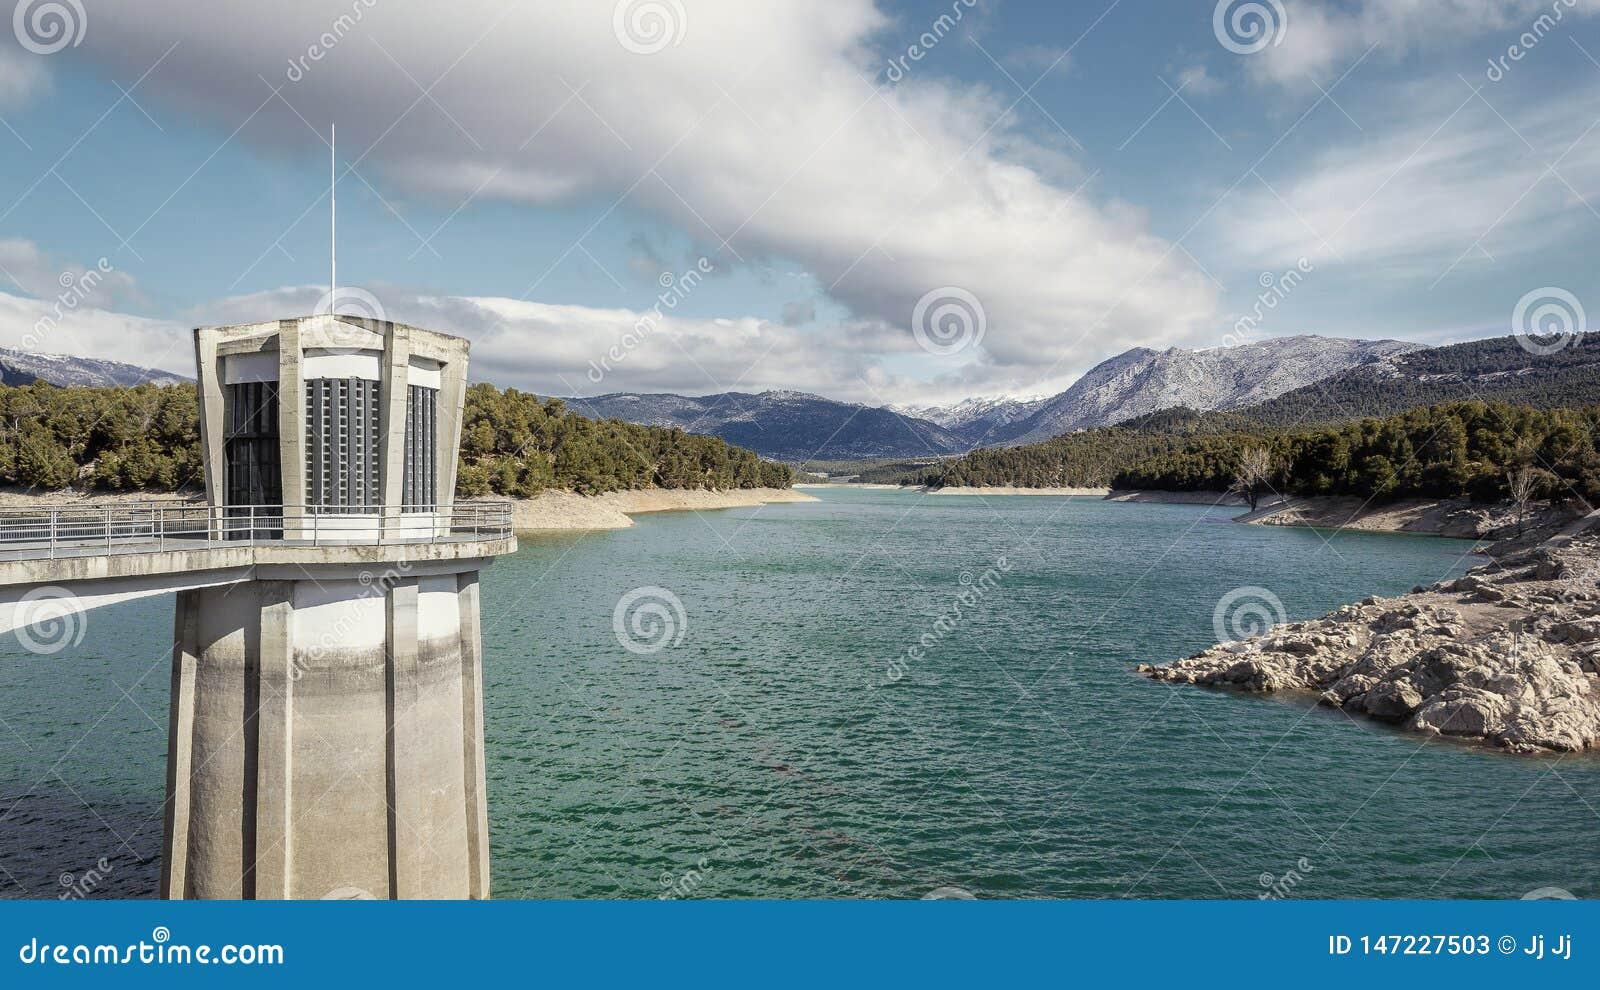 Relaxing landscape of Lake La Bolera